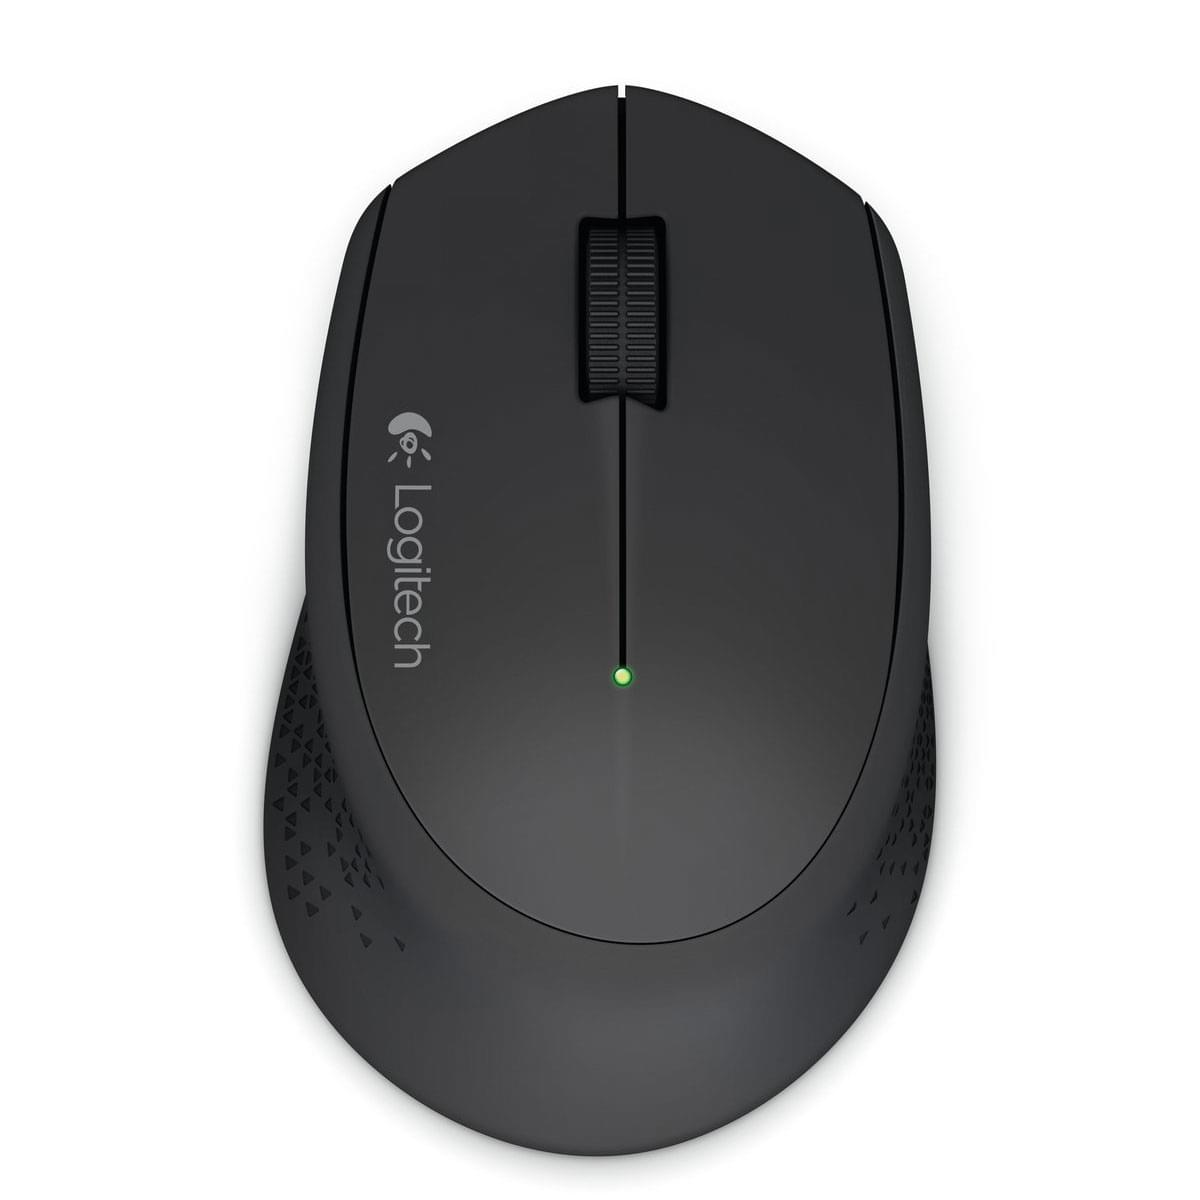 Logitech Wireless Mouse M280 - Souris PC Logitech - Cybertek.fr - 0